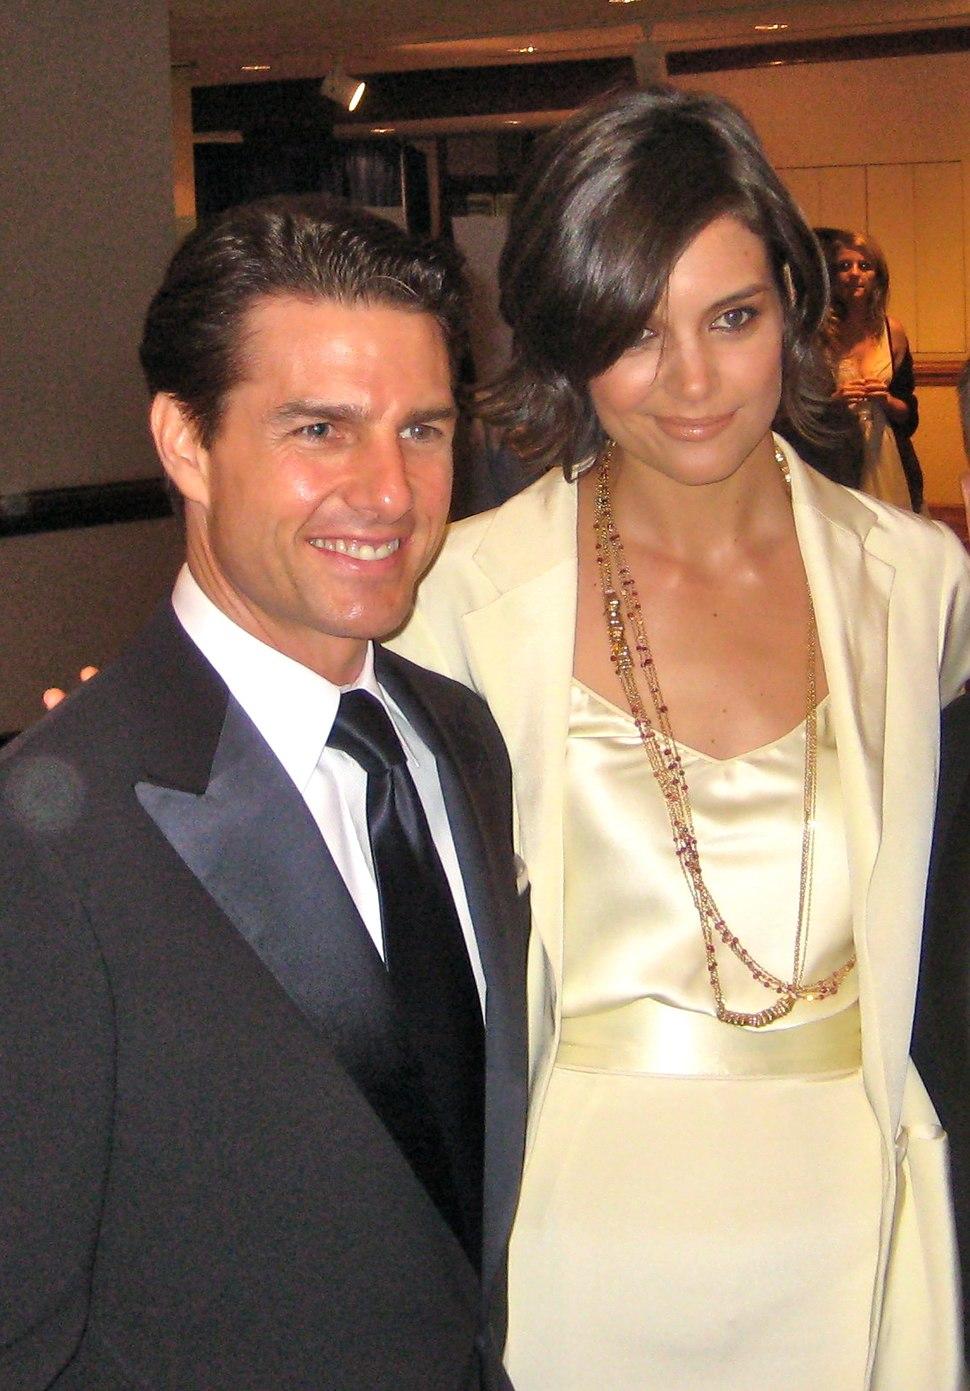 Tom Cruise & Katie Holmes WHCAD